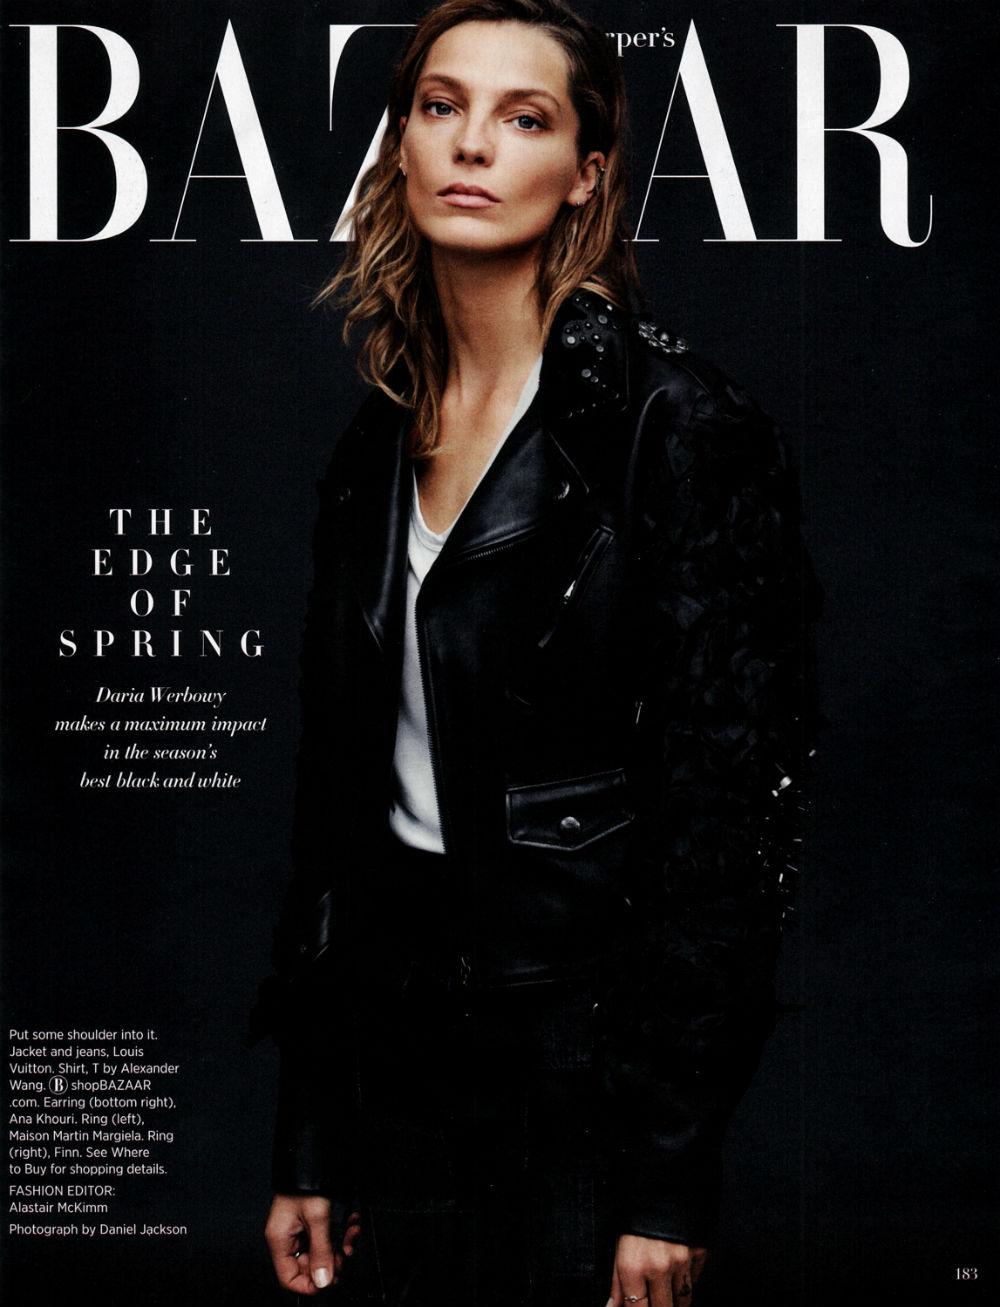 Harpers_Bazaar_February_2014_Cover.jpg